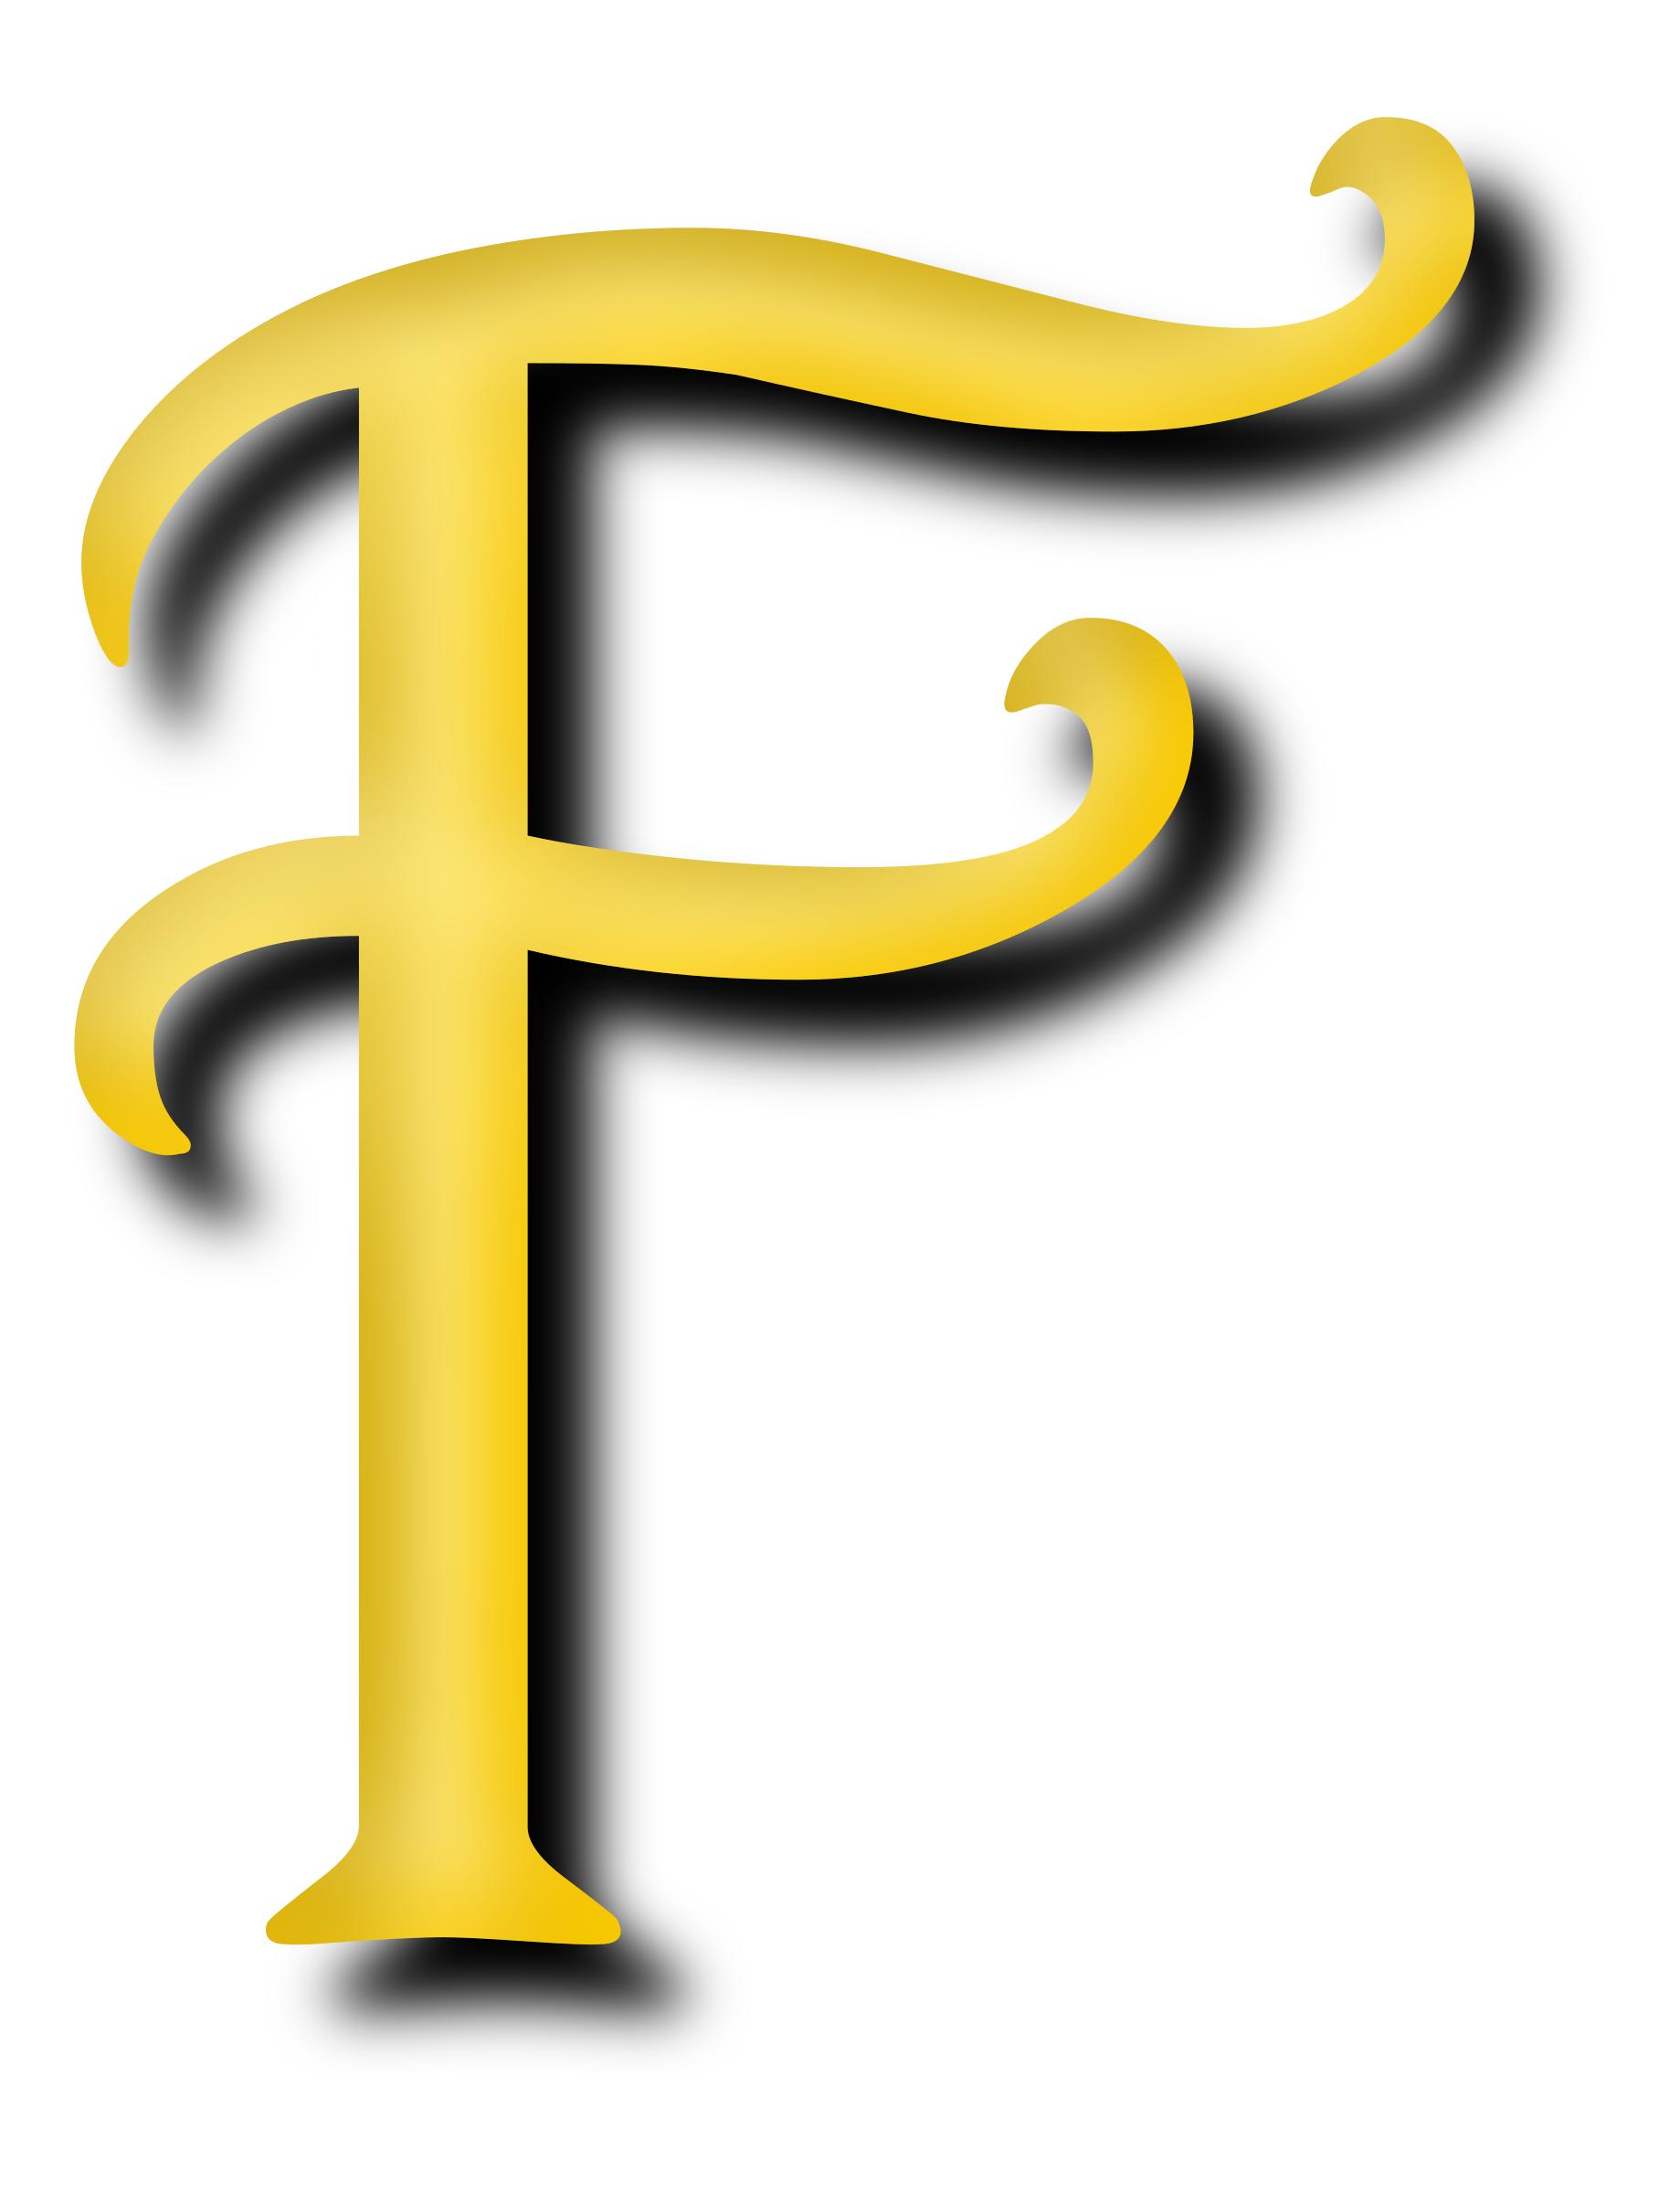 Clipart - Alphabet 13, letter F